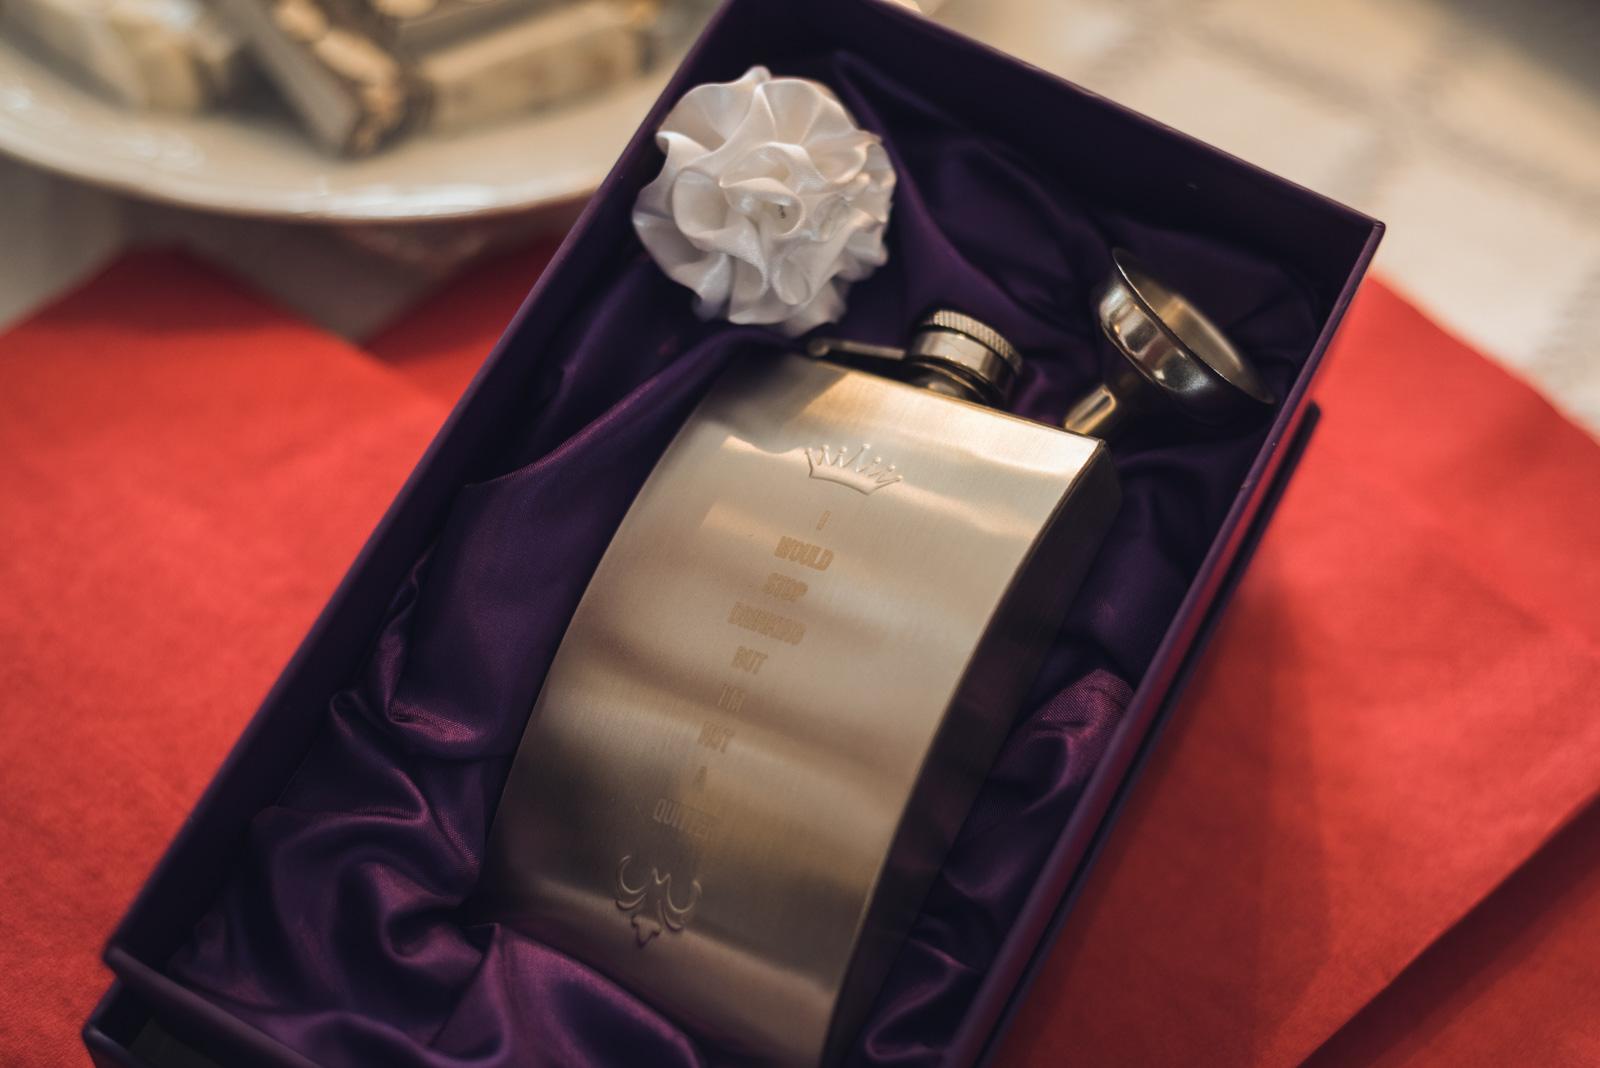 rheana-chris-wedding-blog-11.jpg